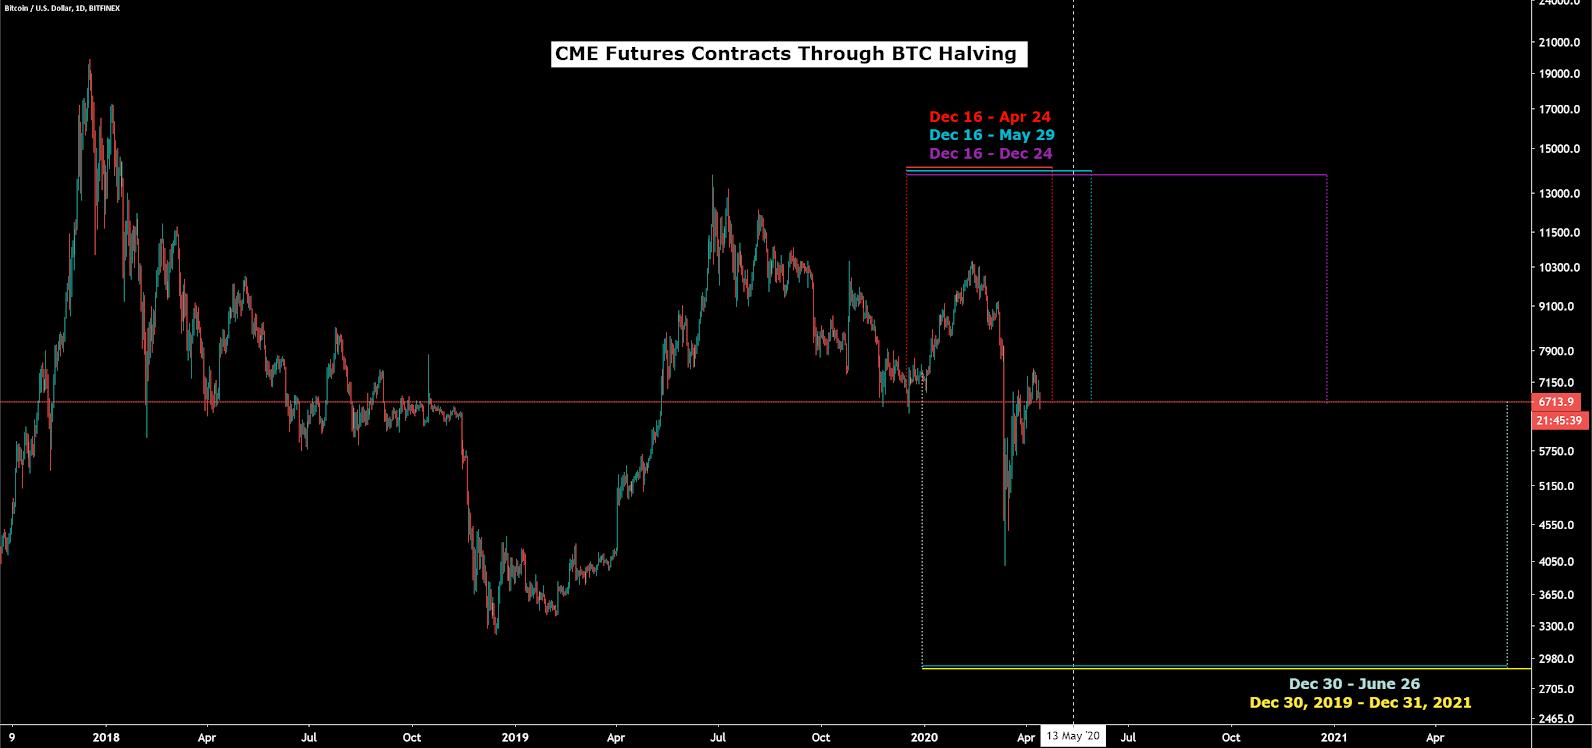 Bitcoin Price Analysis 13 Apr 2020 (22)